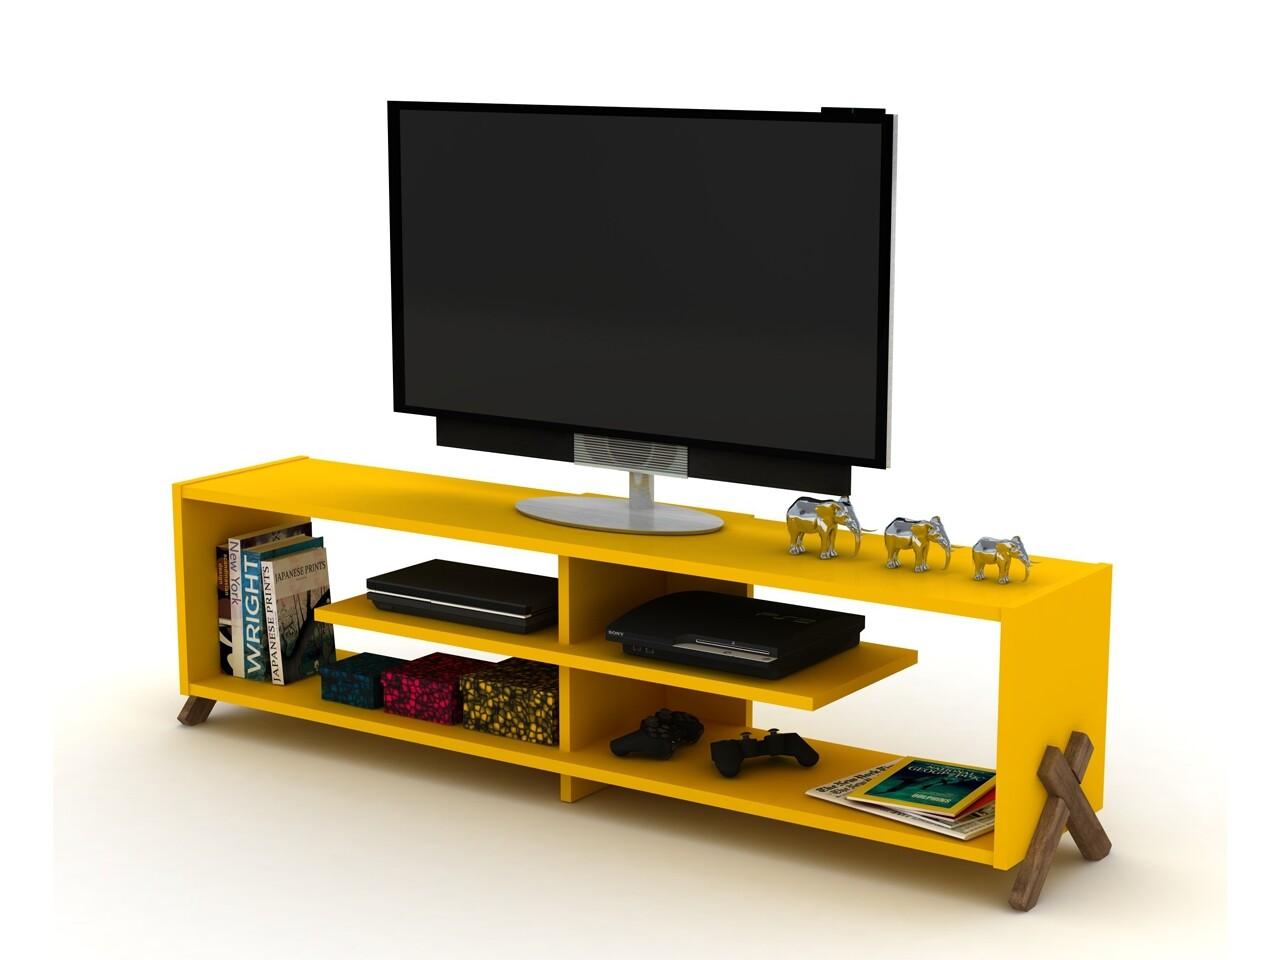 Comoda TV Rafevi Kipp, 145 x 31 x 39 cm, PAL/lemn, walnut/galben